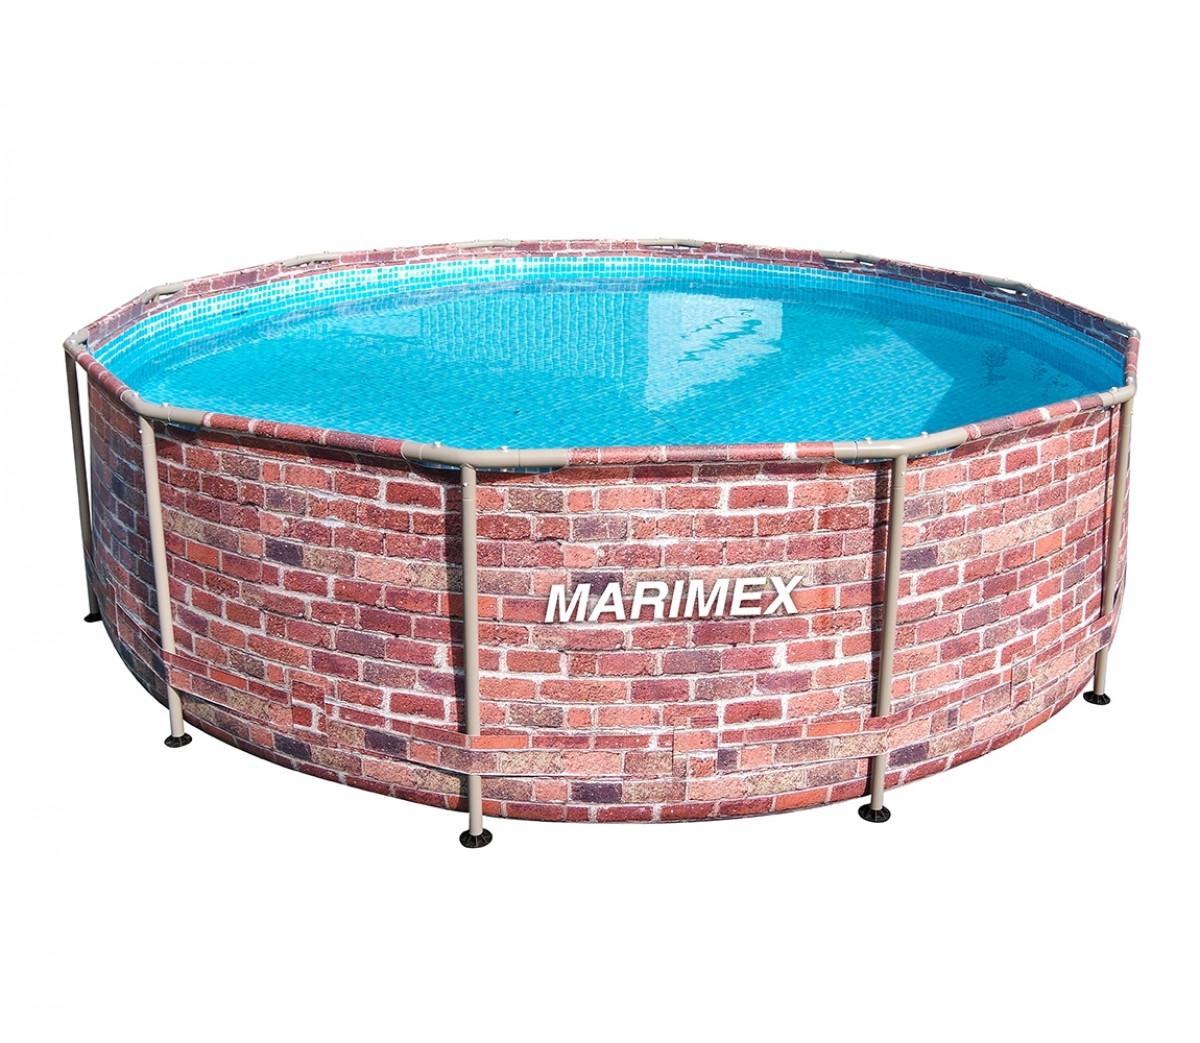 Marimex   Bazén Florida 3,66x0,99 m bez filtrace - motiv CIHLA   10340243